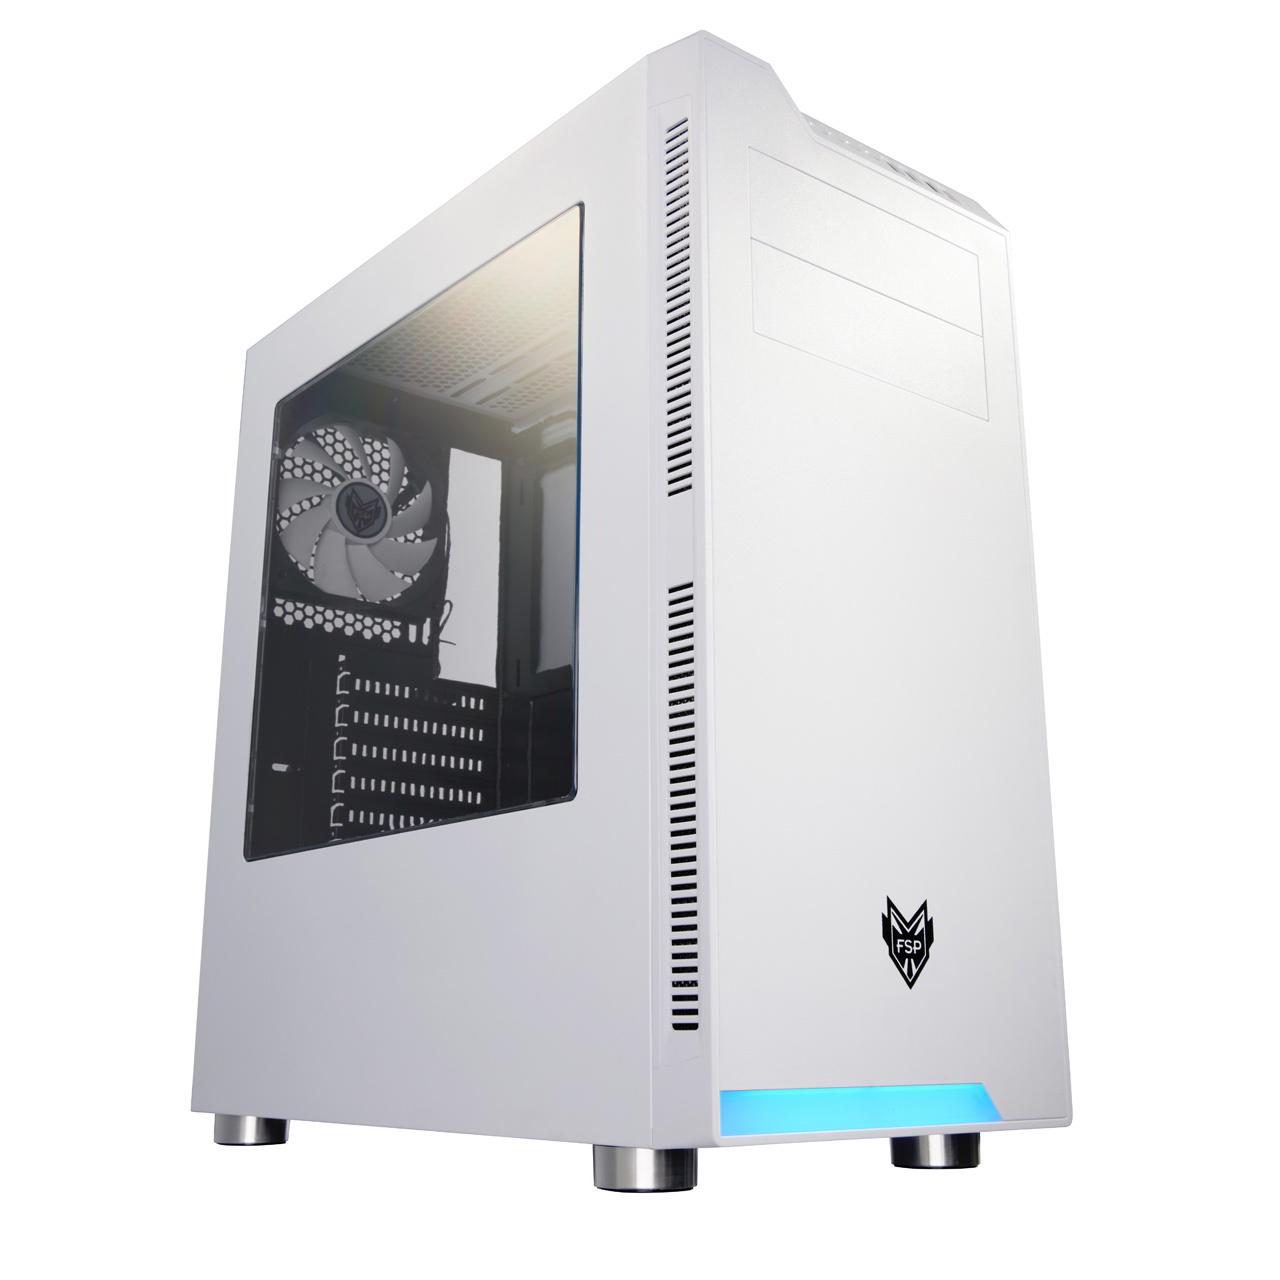 PC-Sziget Info Kft Webshop - FSP - Ház - FSP CMT240 fehér Midi ATX ... 0461945c81